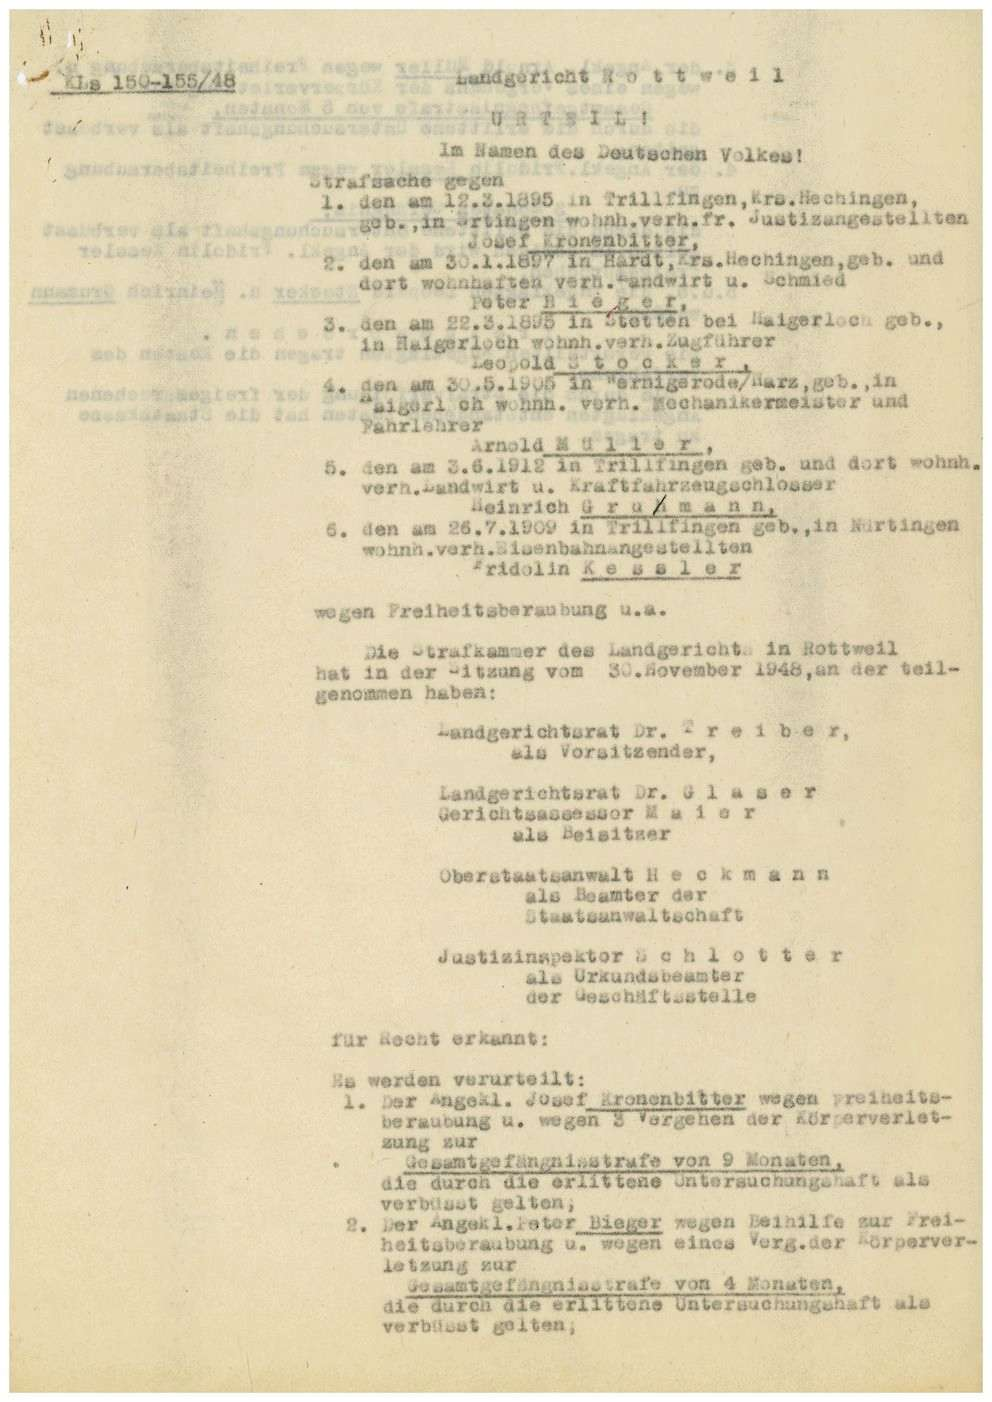 Kronenbitter, Josef, Justizangestellter, Ertingen, Bild 2